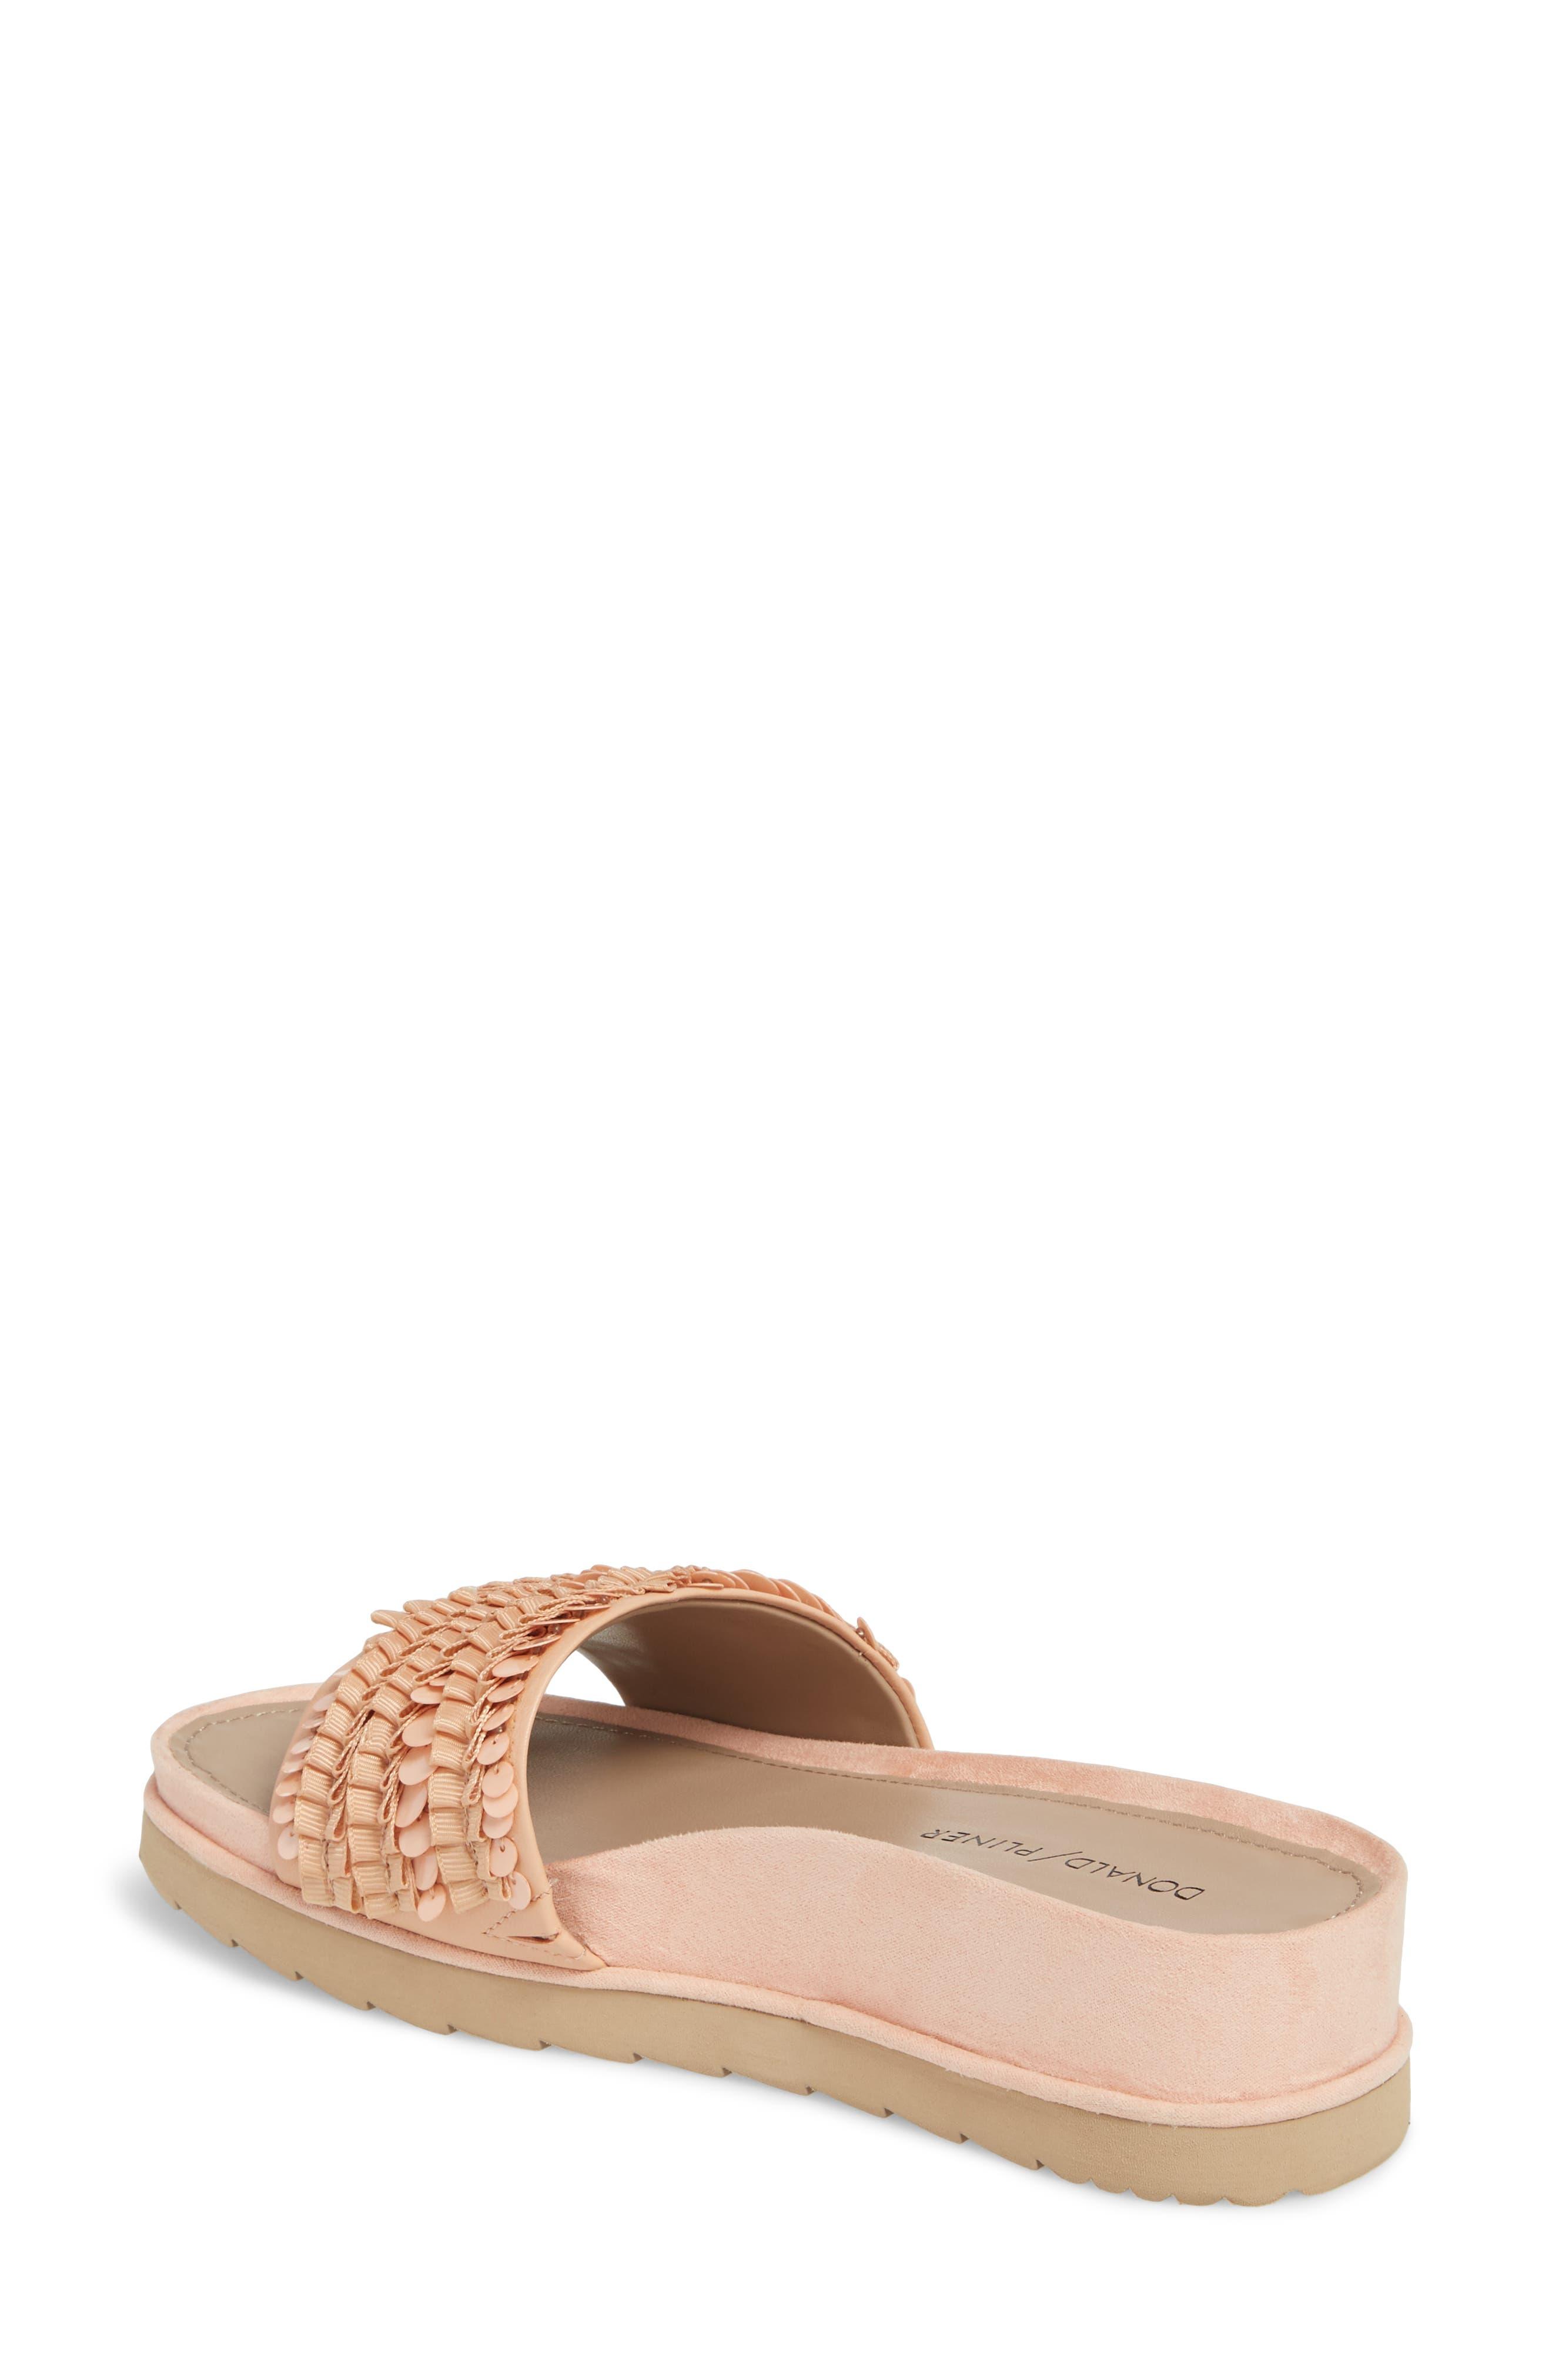 Cava Slide Sandal,                             Alternate thumbnail 2, color,                             Peony Leather